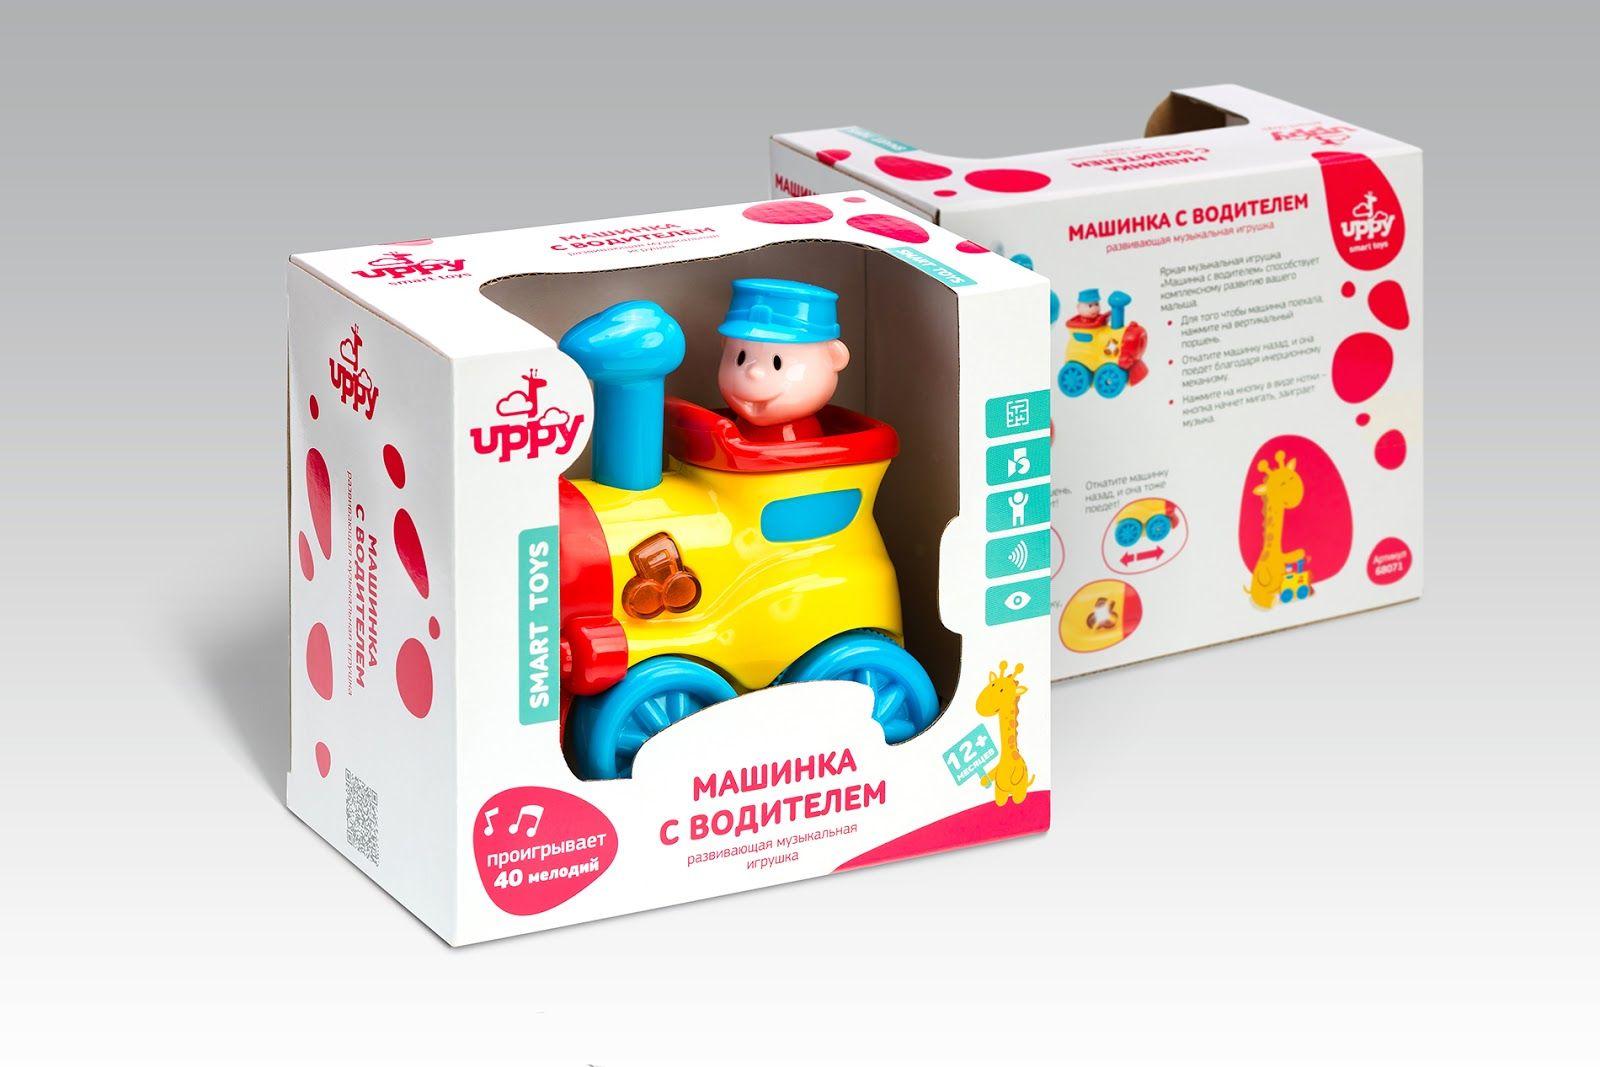 uppy packaging packaging design toy packaging packaging rh pinterest com